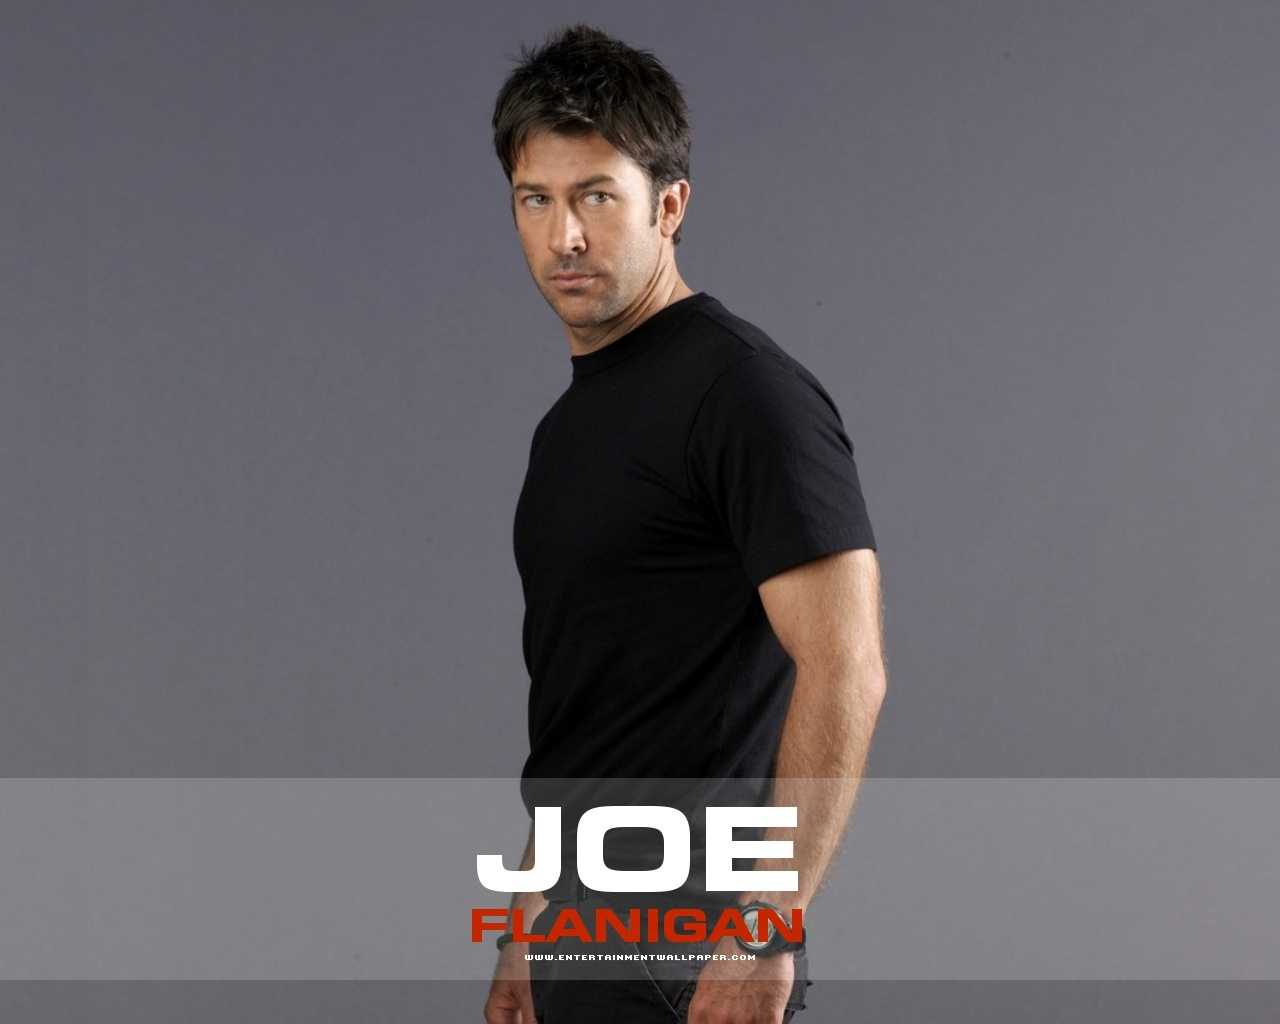 Joe Flanigan